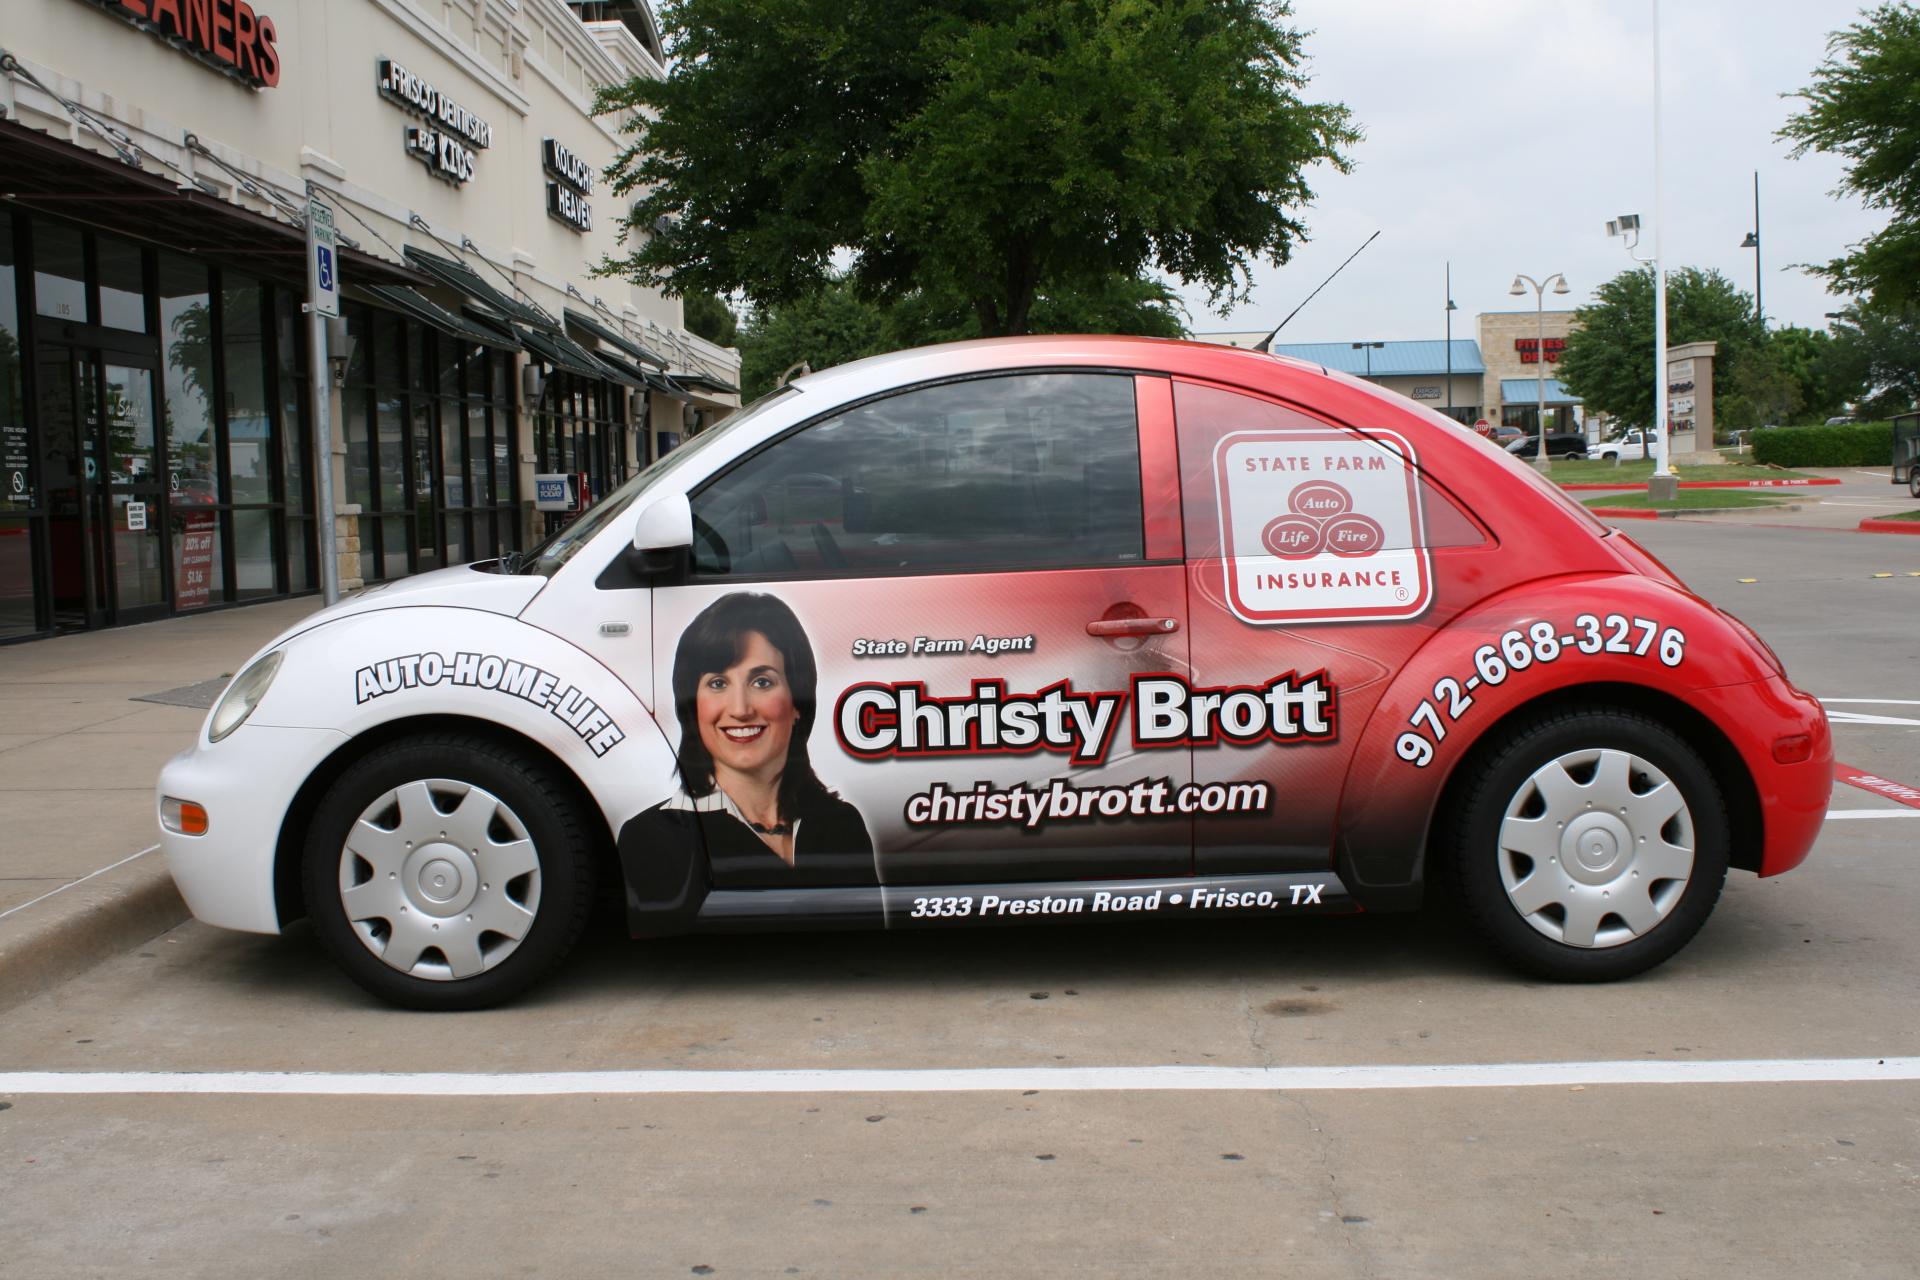 State Farm Agent Christy Brott, State Farm Vehicle Wraps, vehicle wraps dallas tx